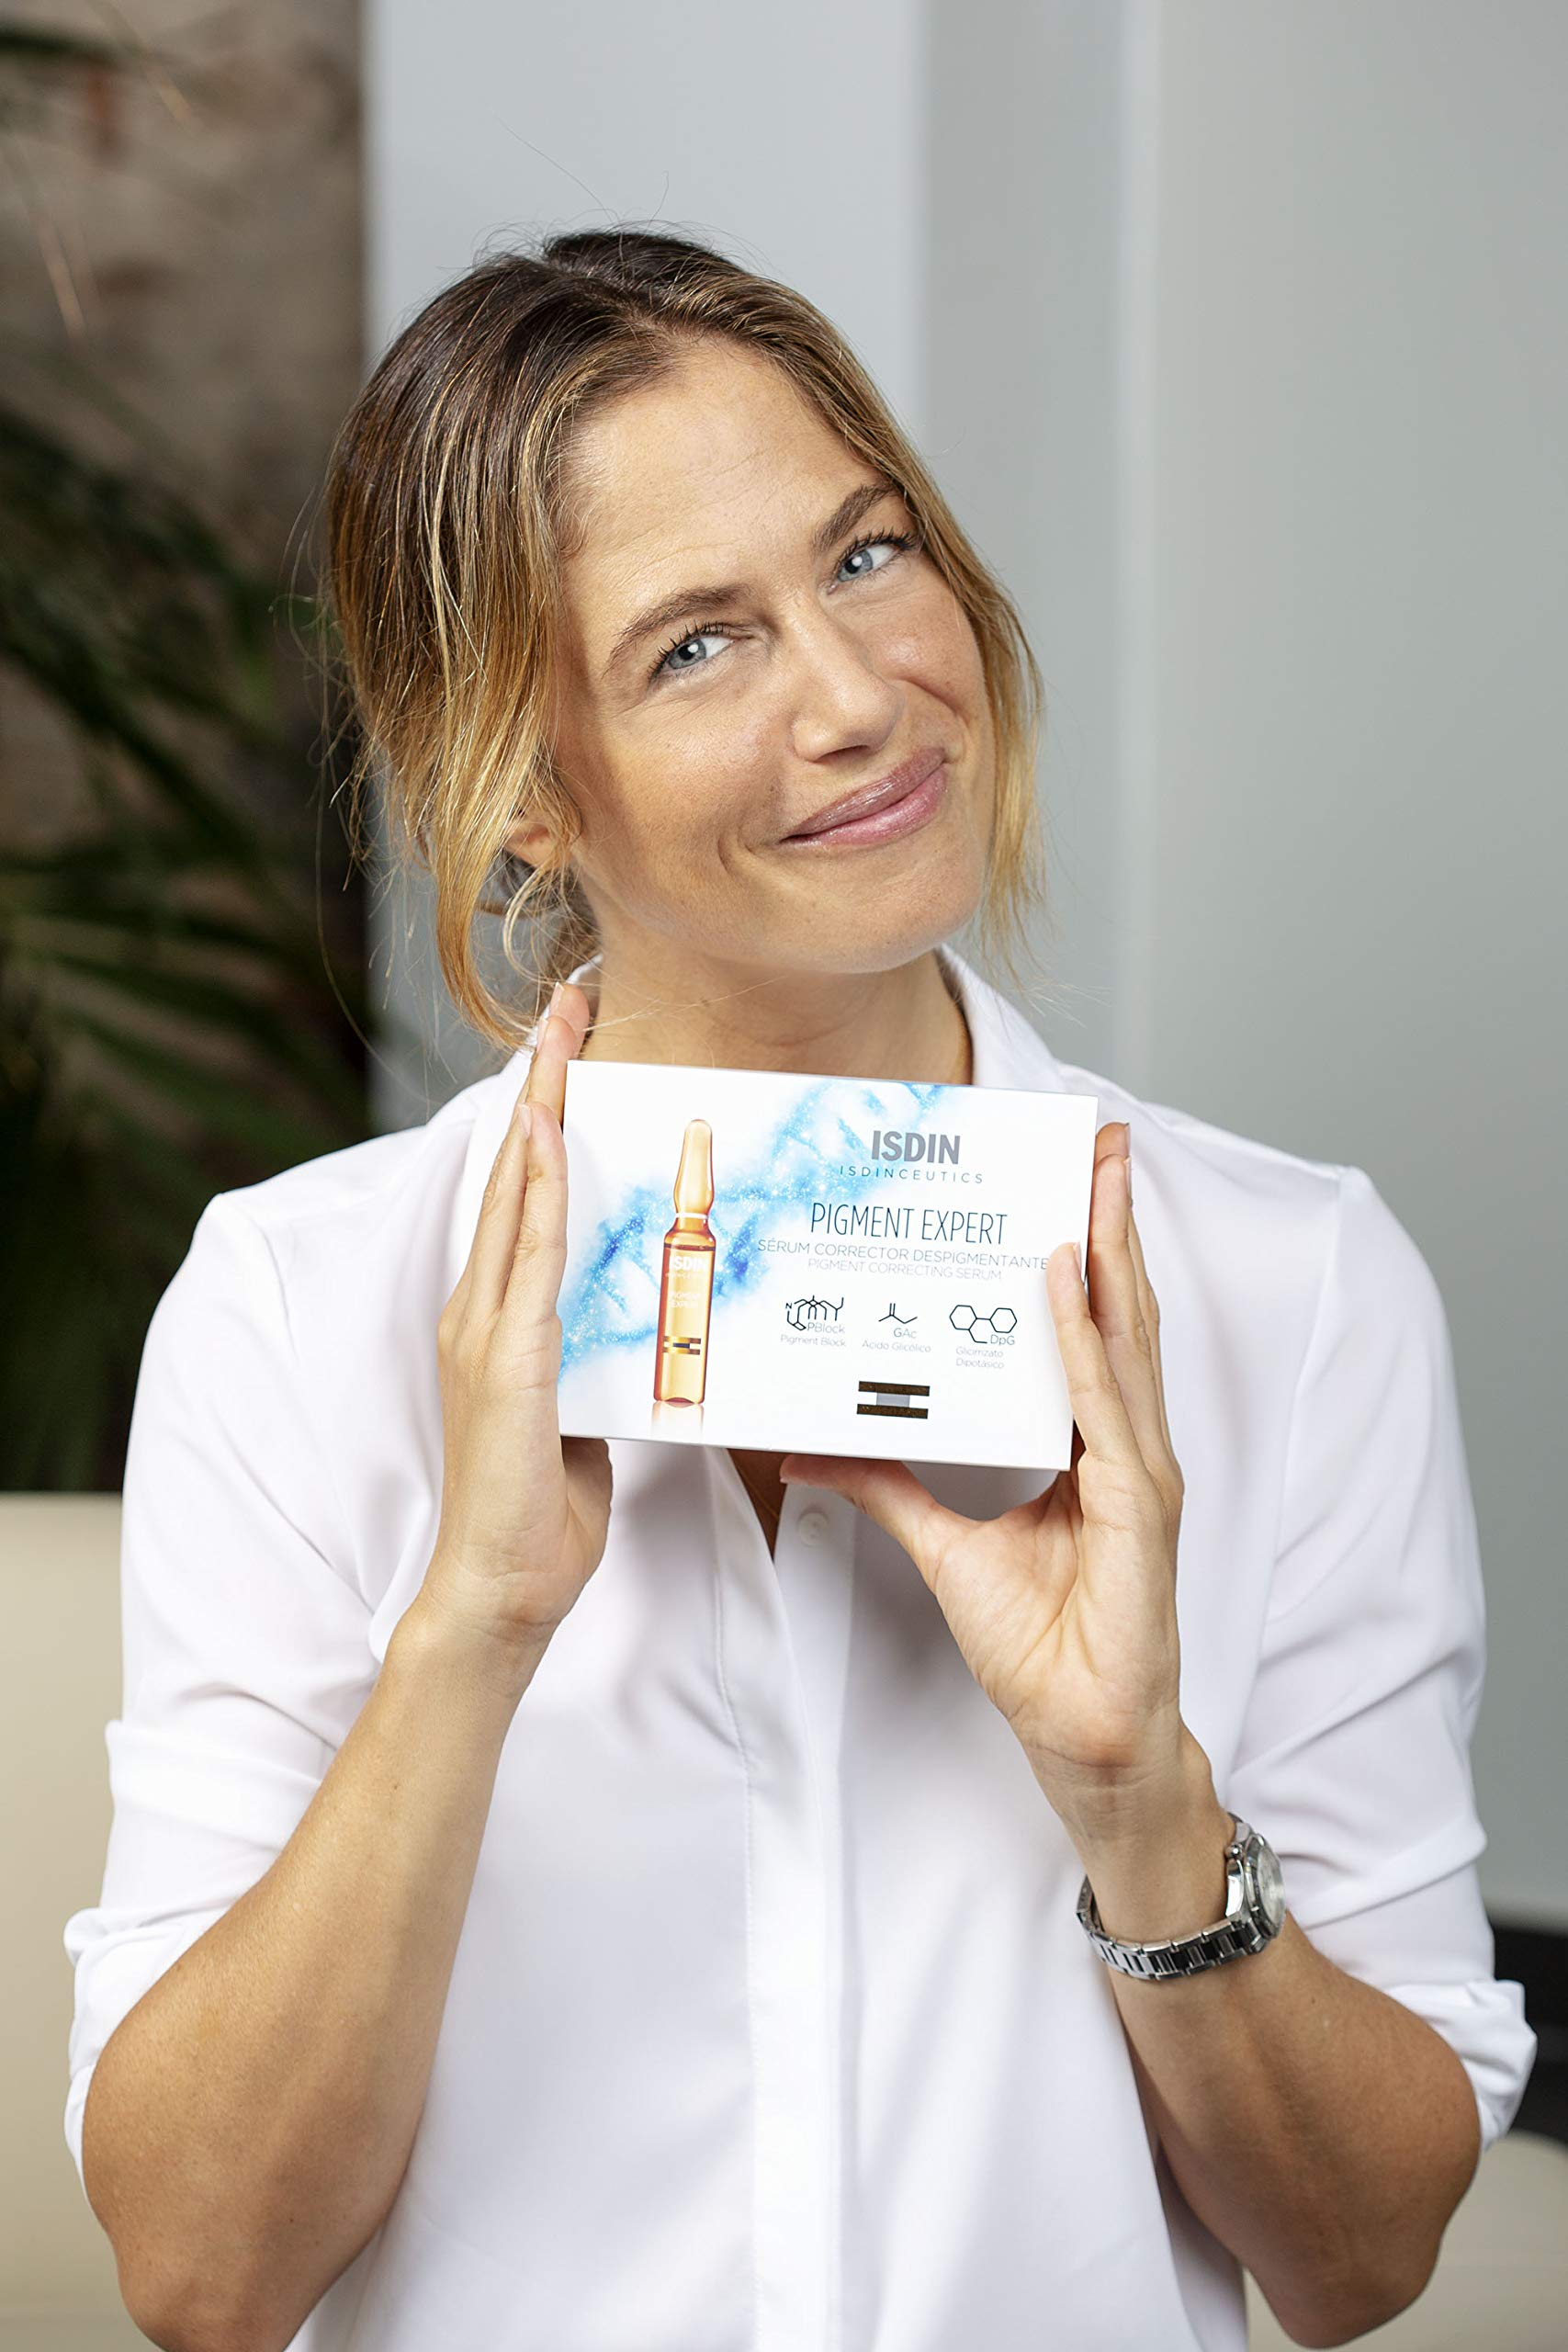 ISDINCEUTICS Pigment Expert Sérum de día Corrector Despigmentante con Acción Antimanchas